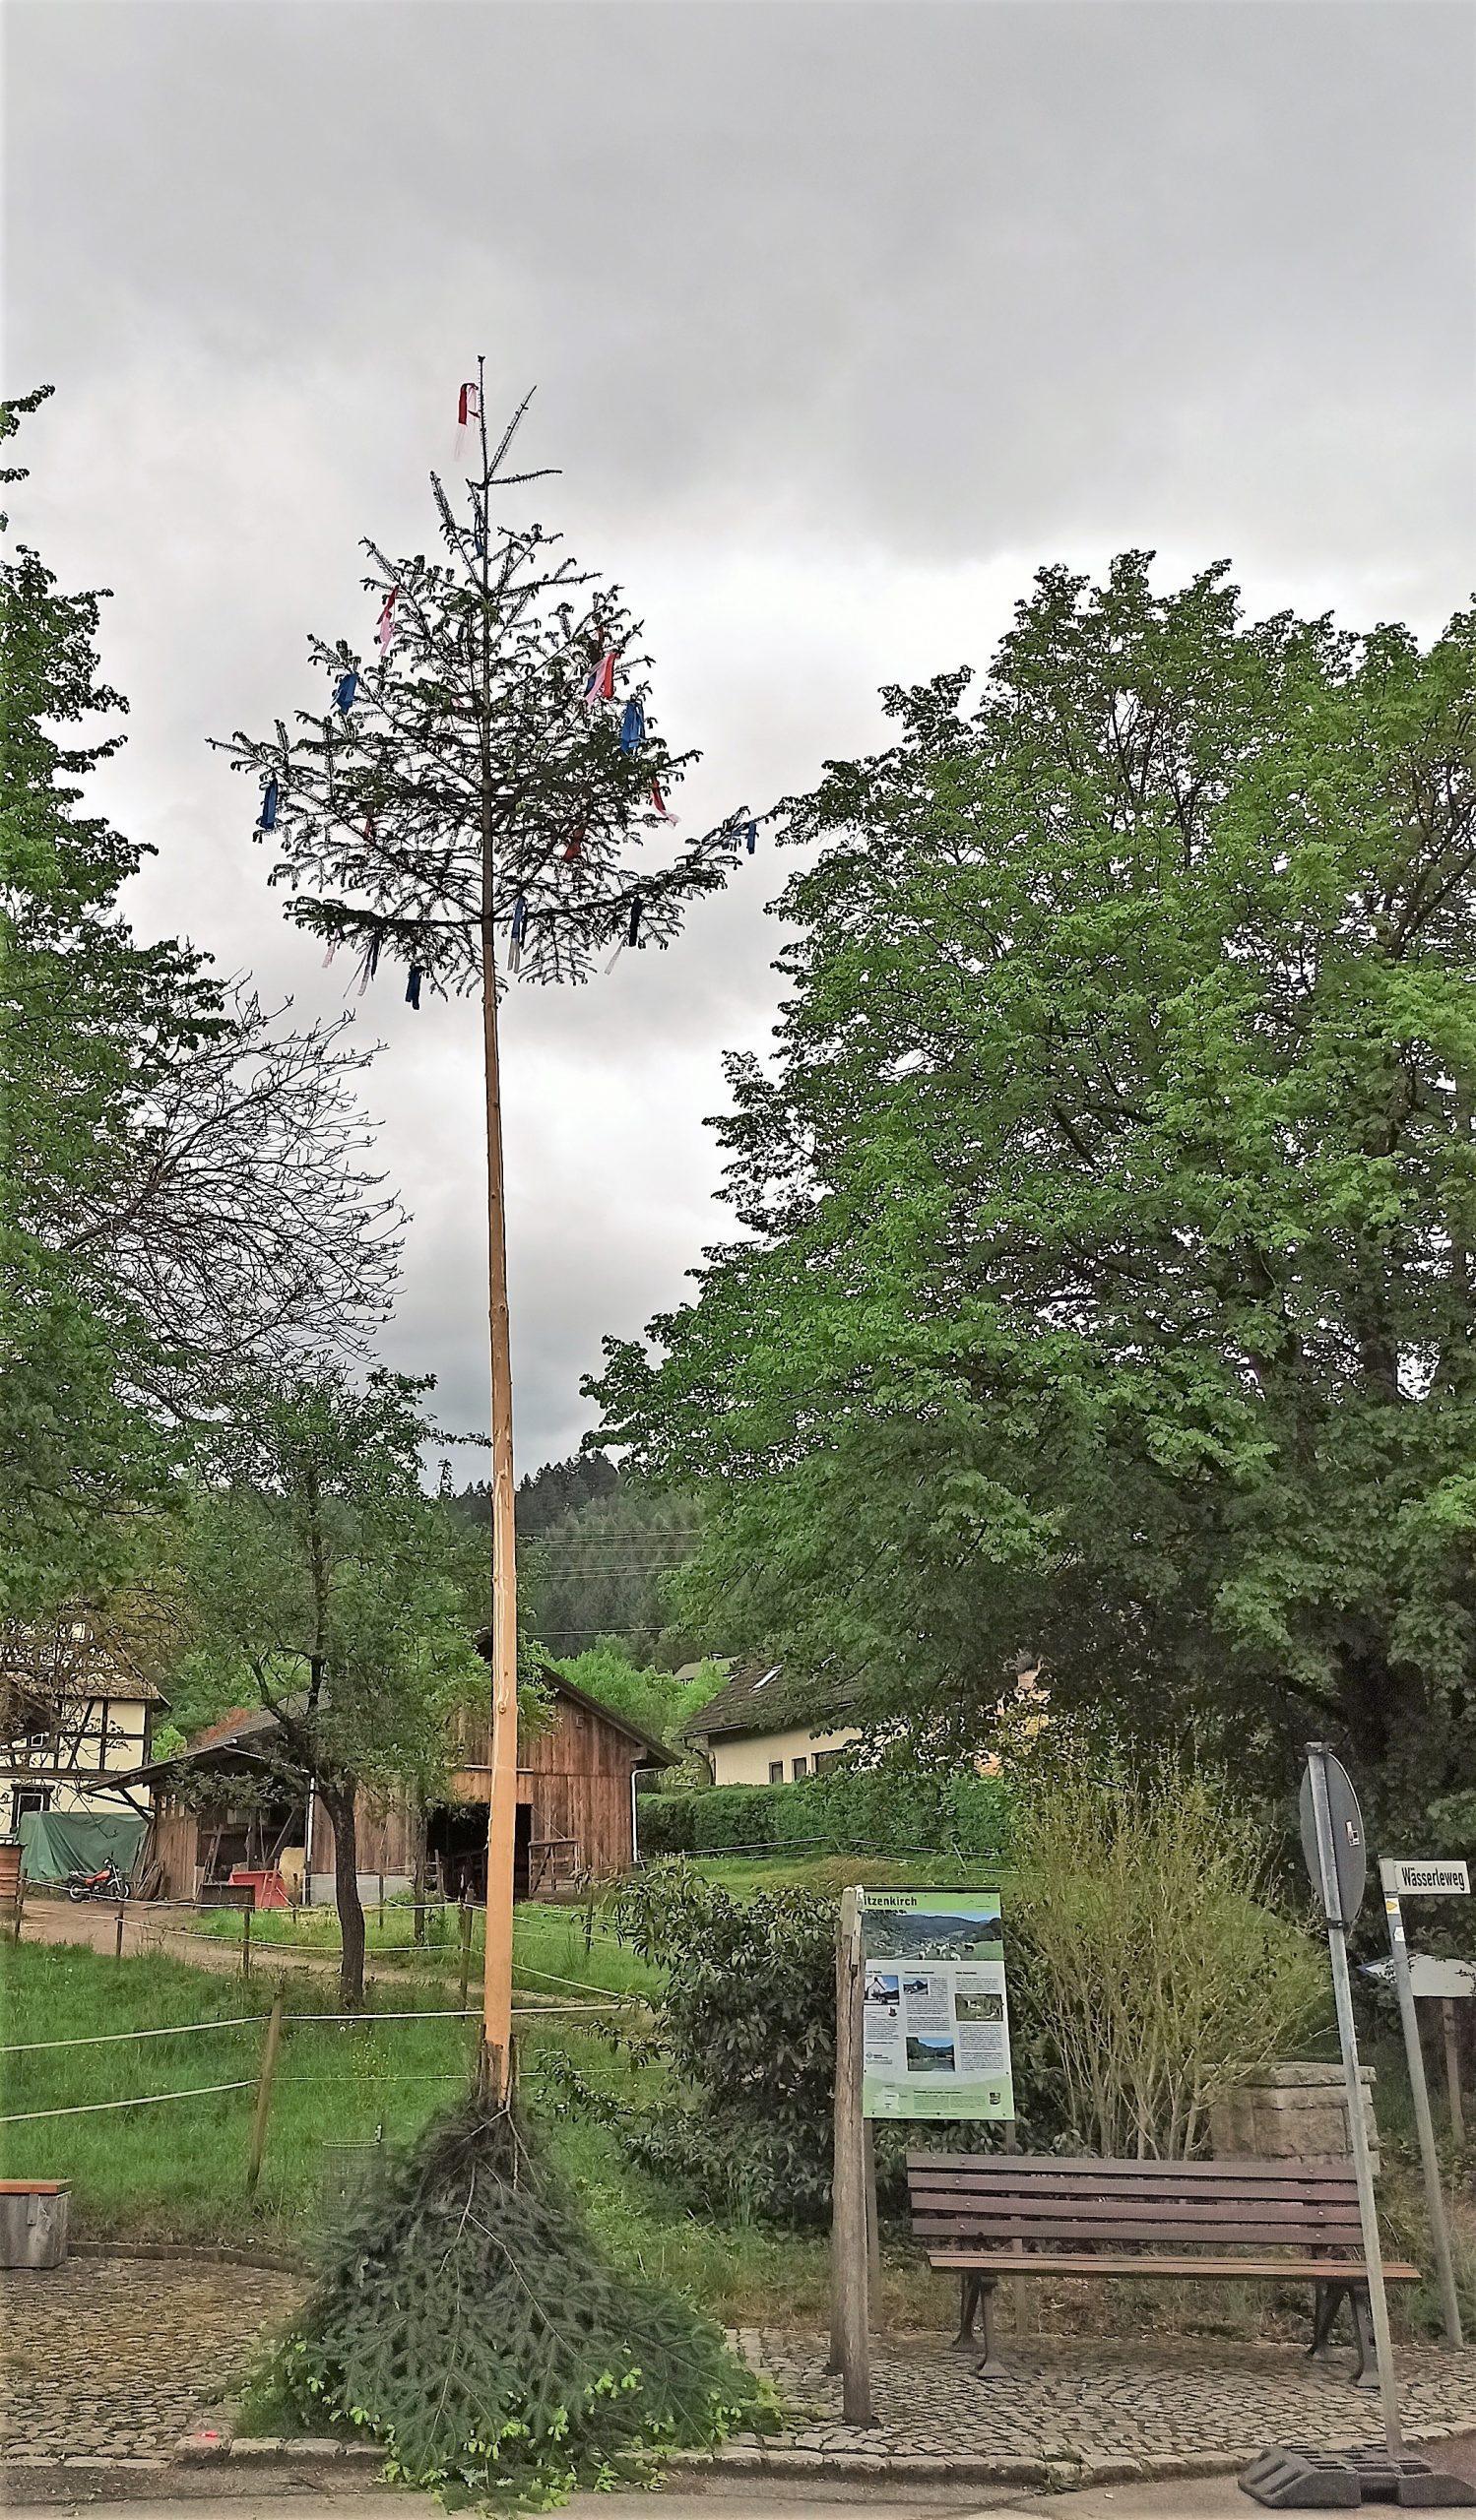 Corona-Maibaum in Sitzenkirch